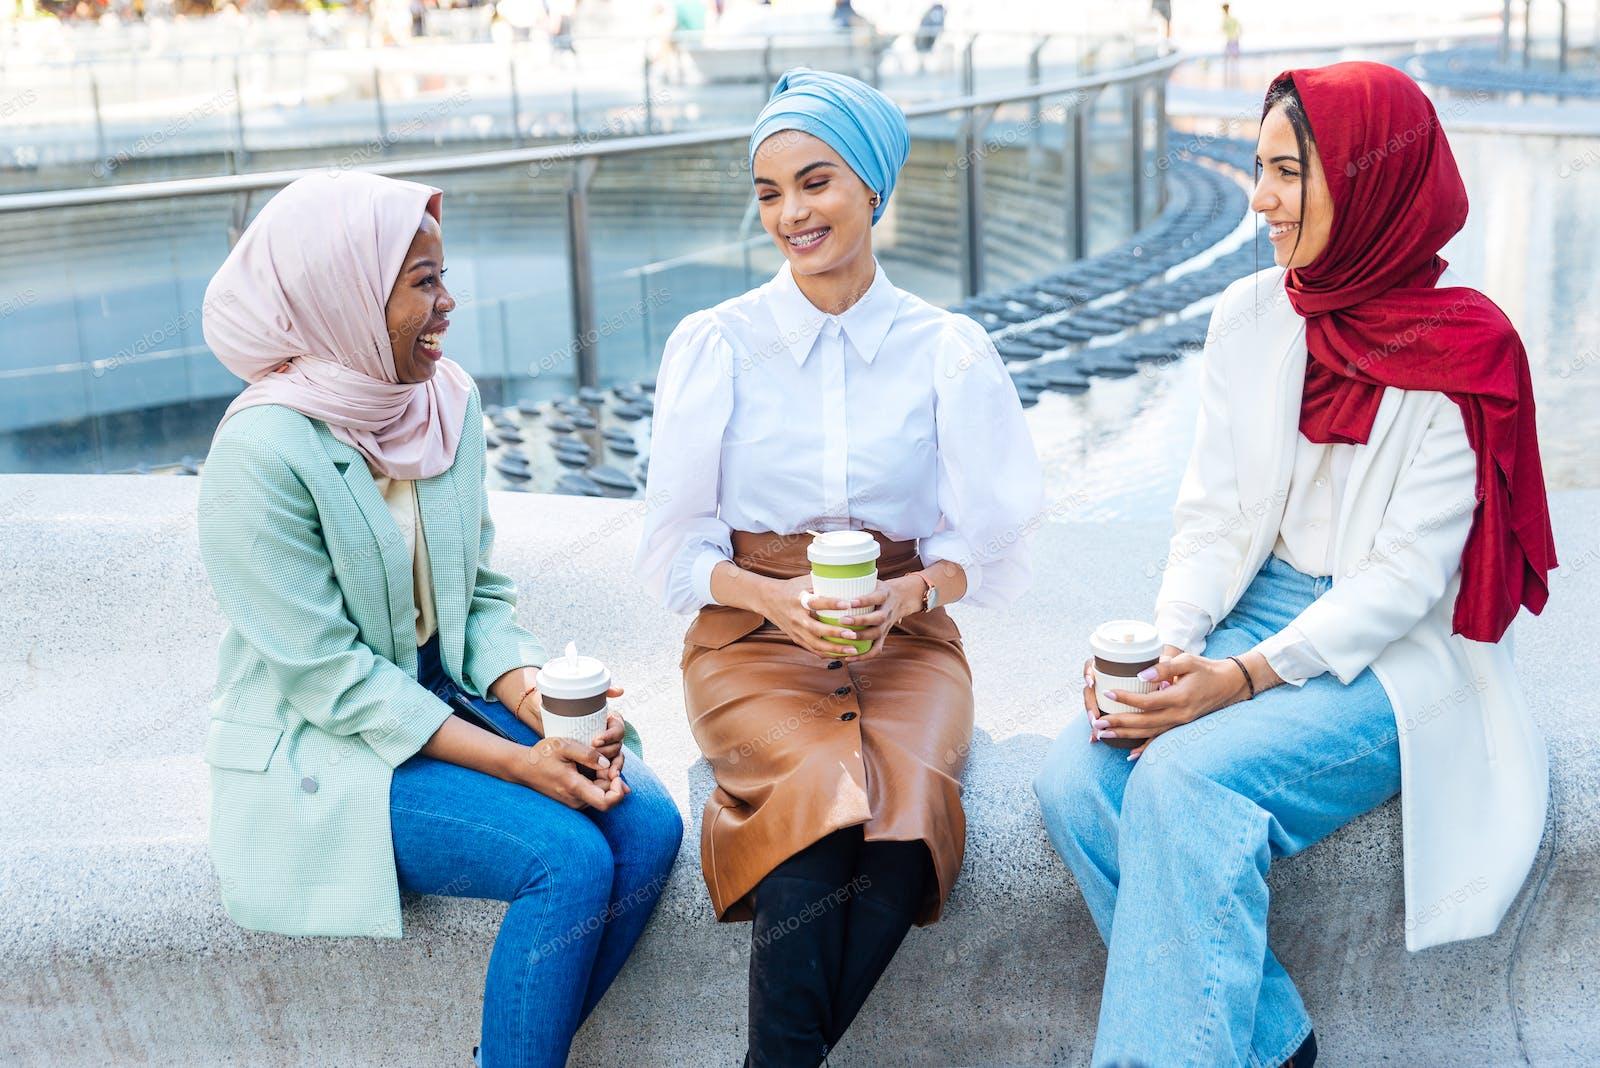 Girls hijab of pics wearing Young girls